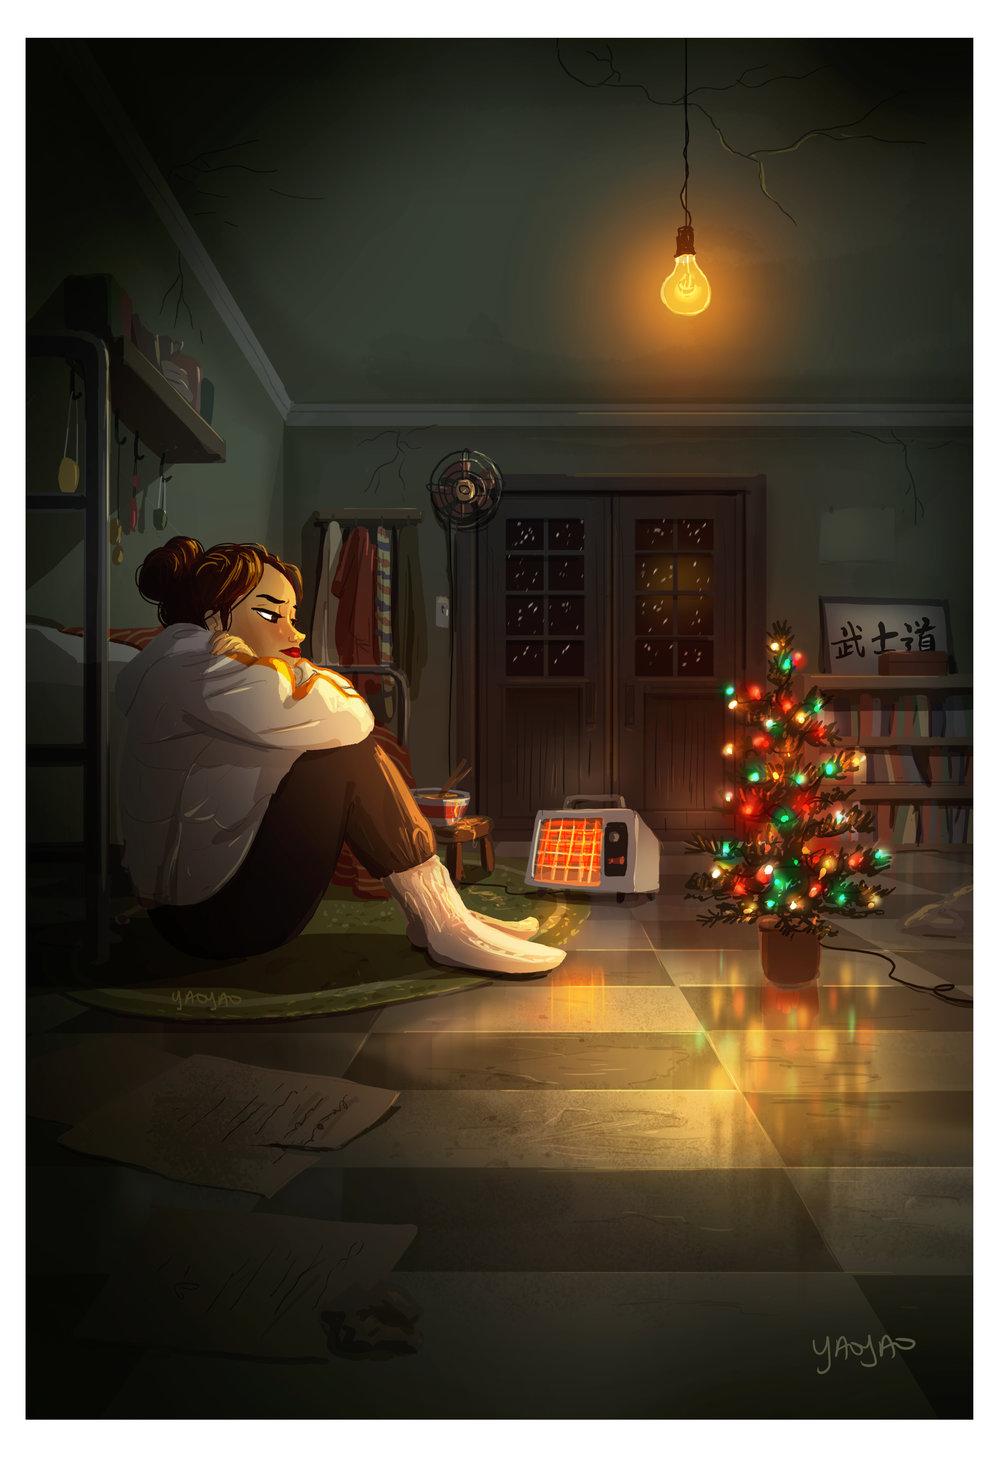 Melancholy Christmas